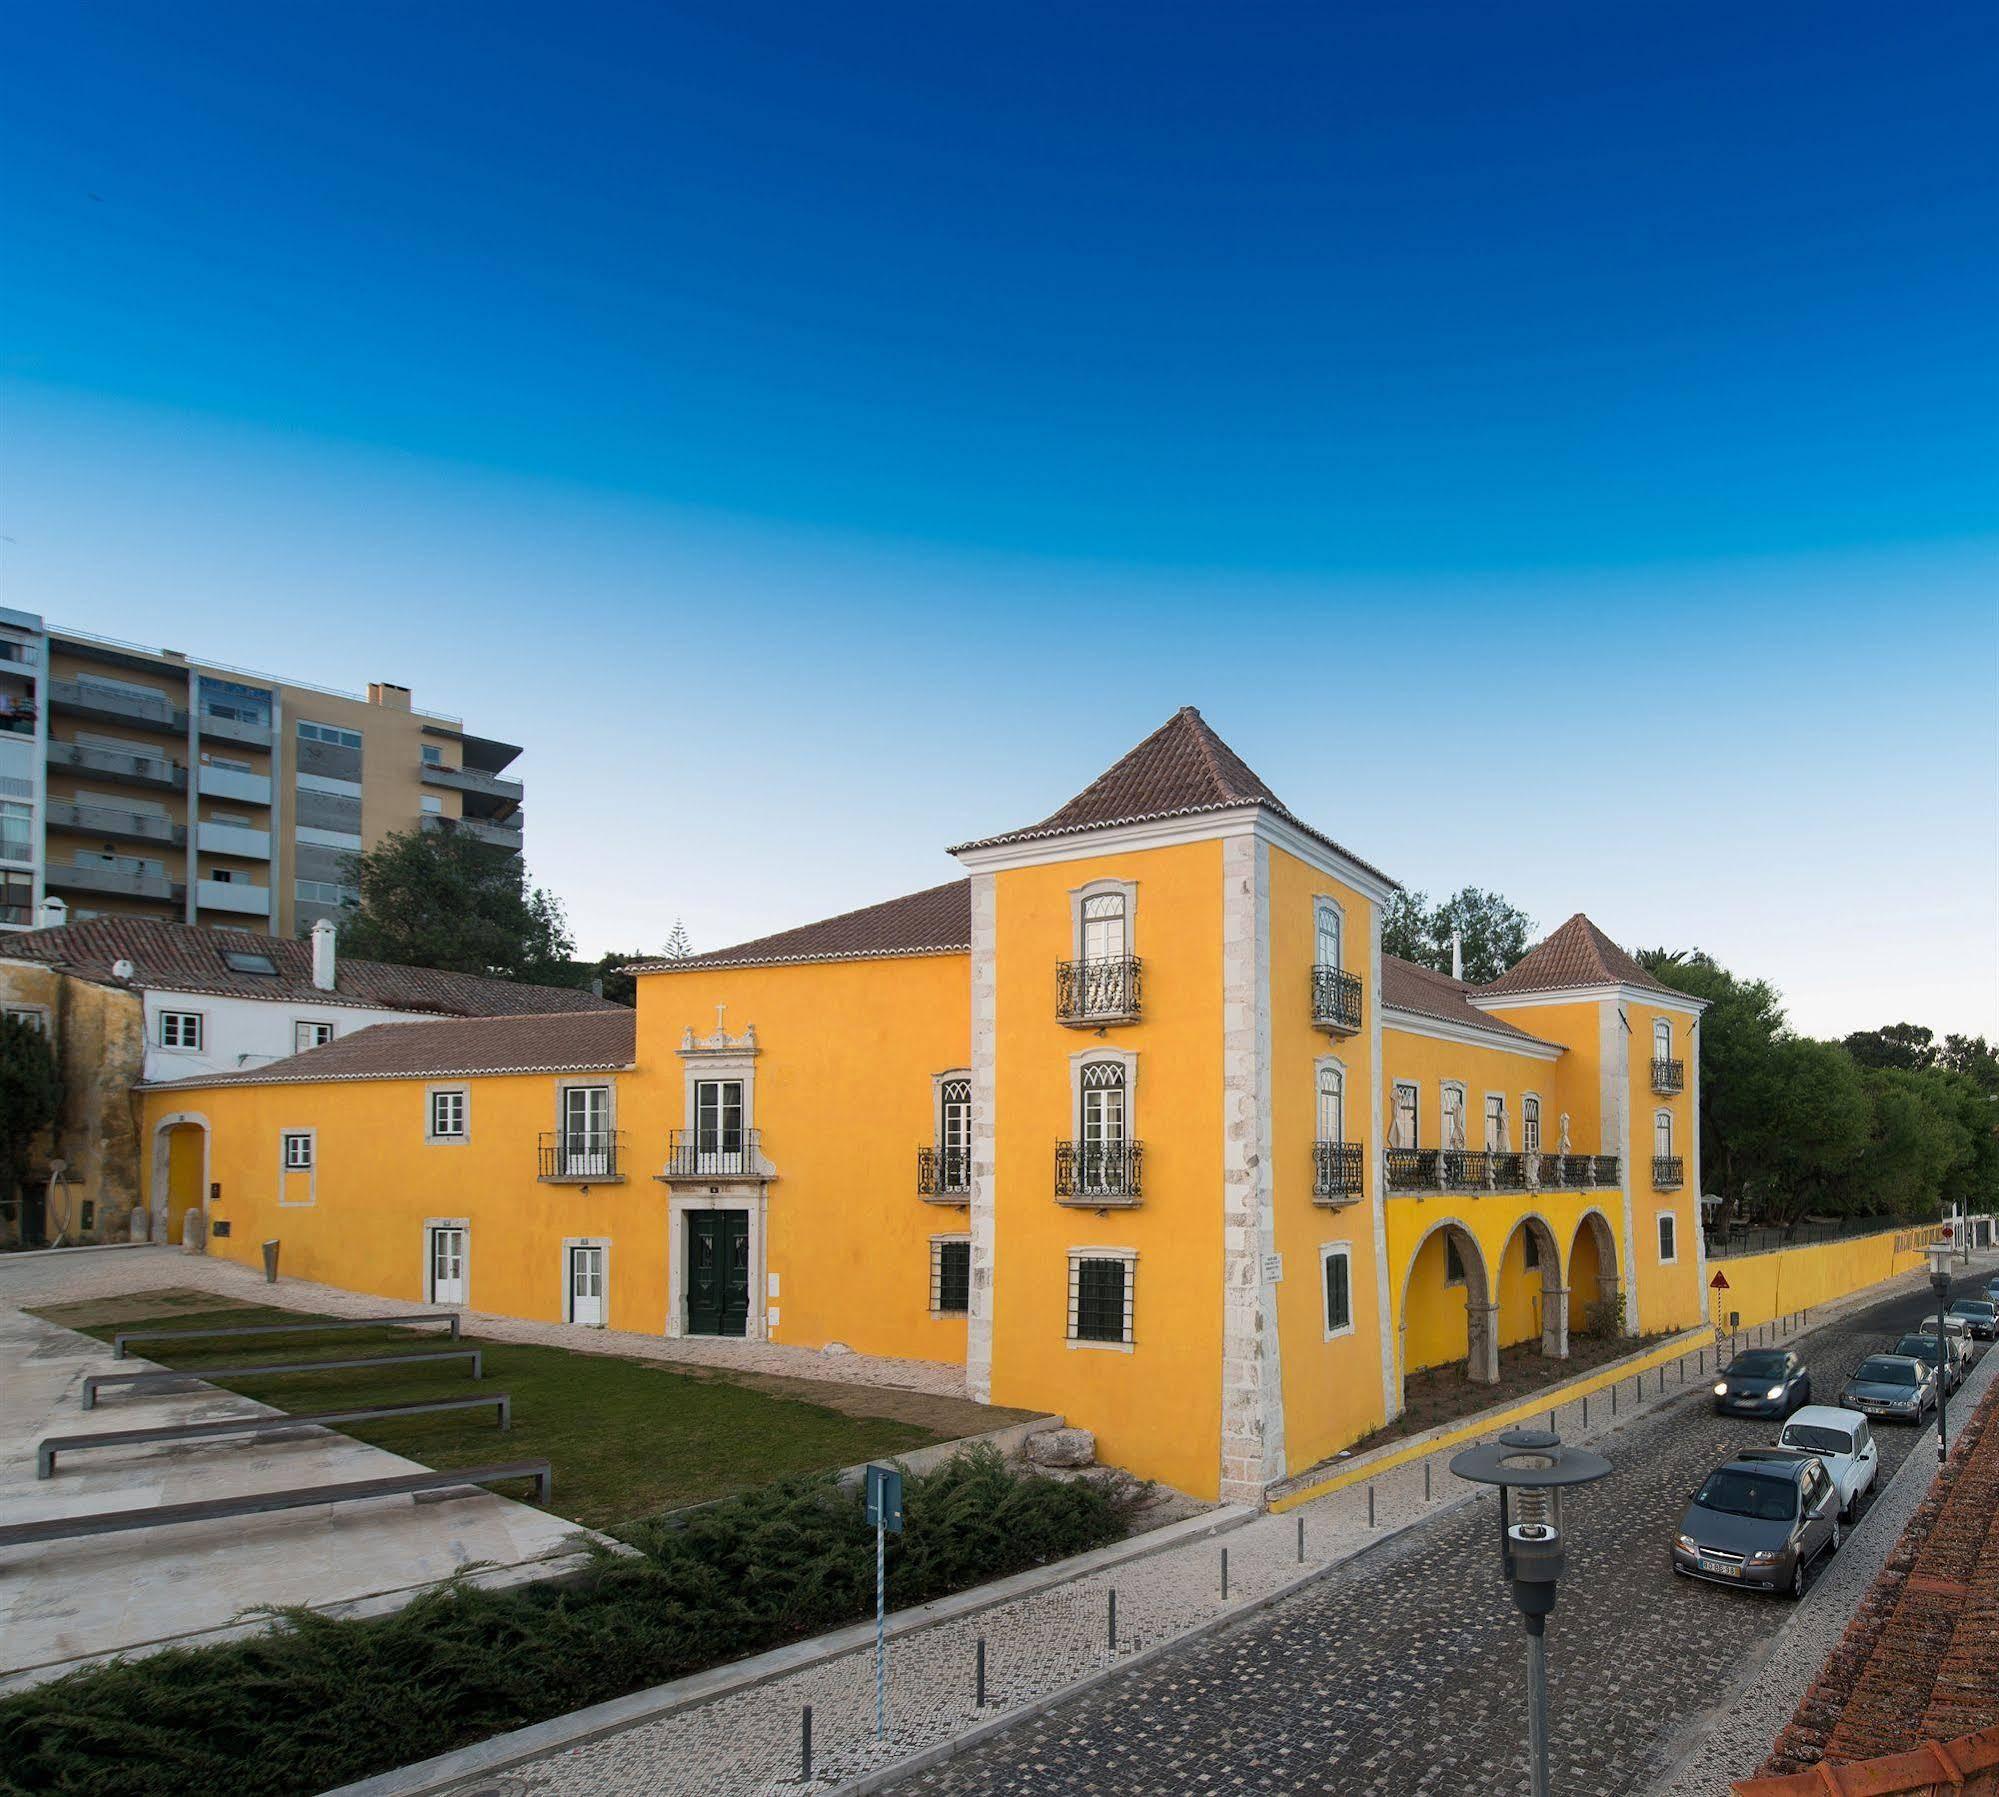 Vila Gale Collection Palácio dos Arcos - Paco De Arcos